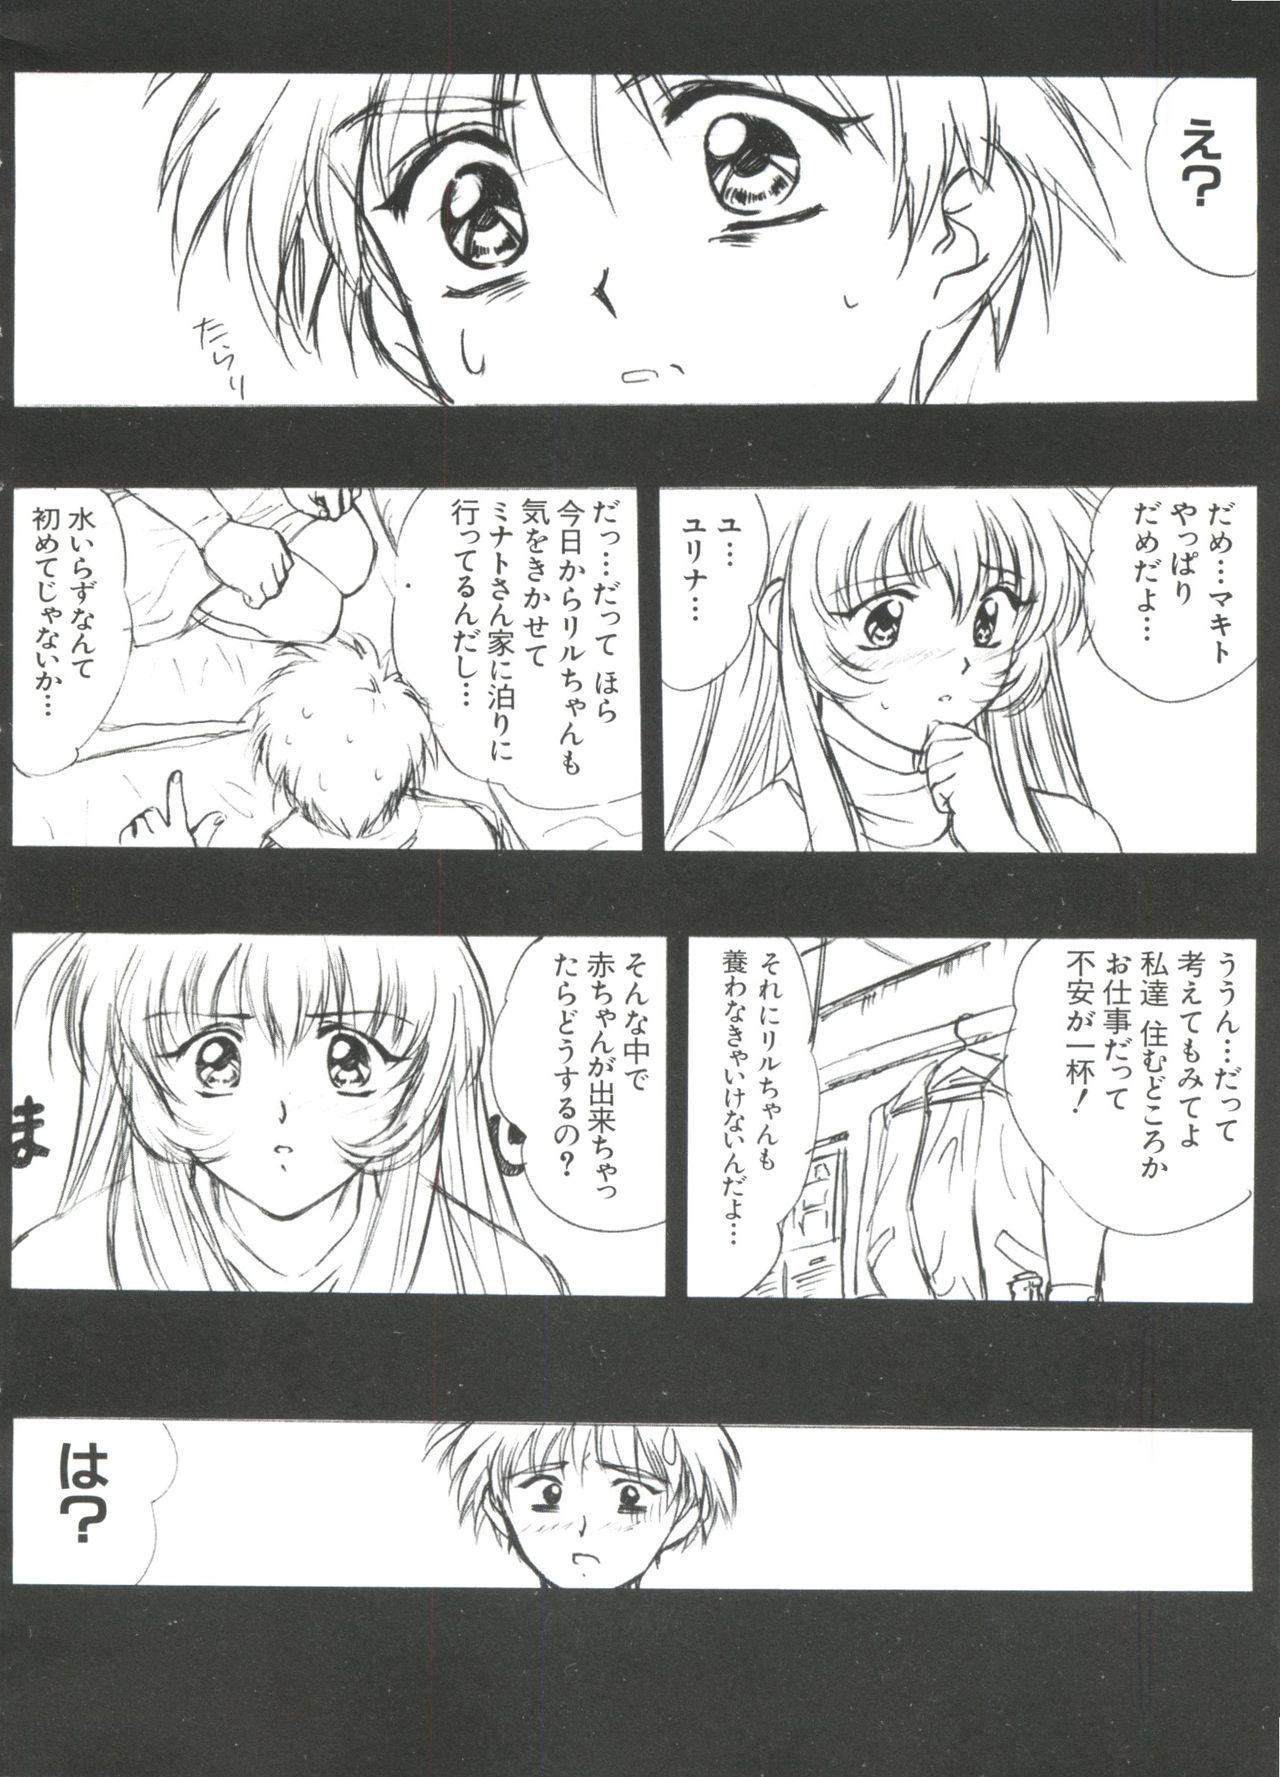 Love Chara Taizen No. 1 159